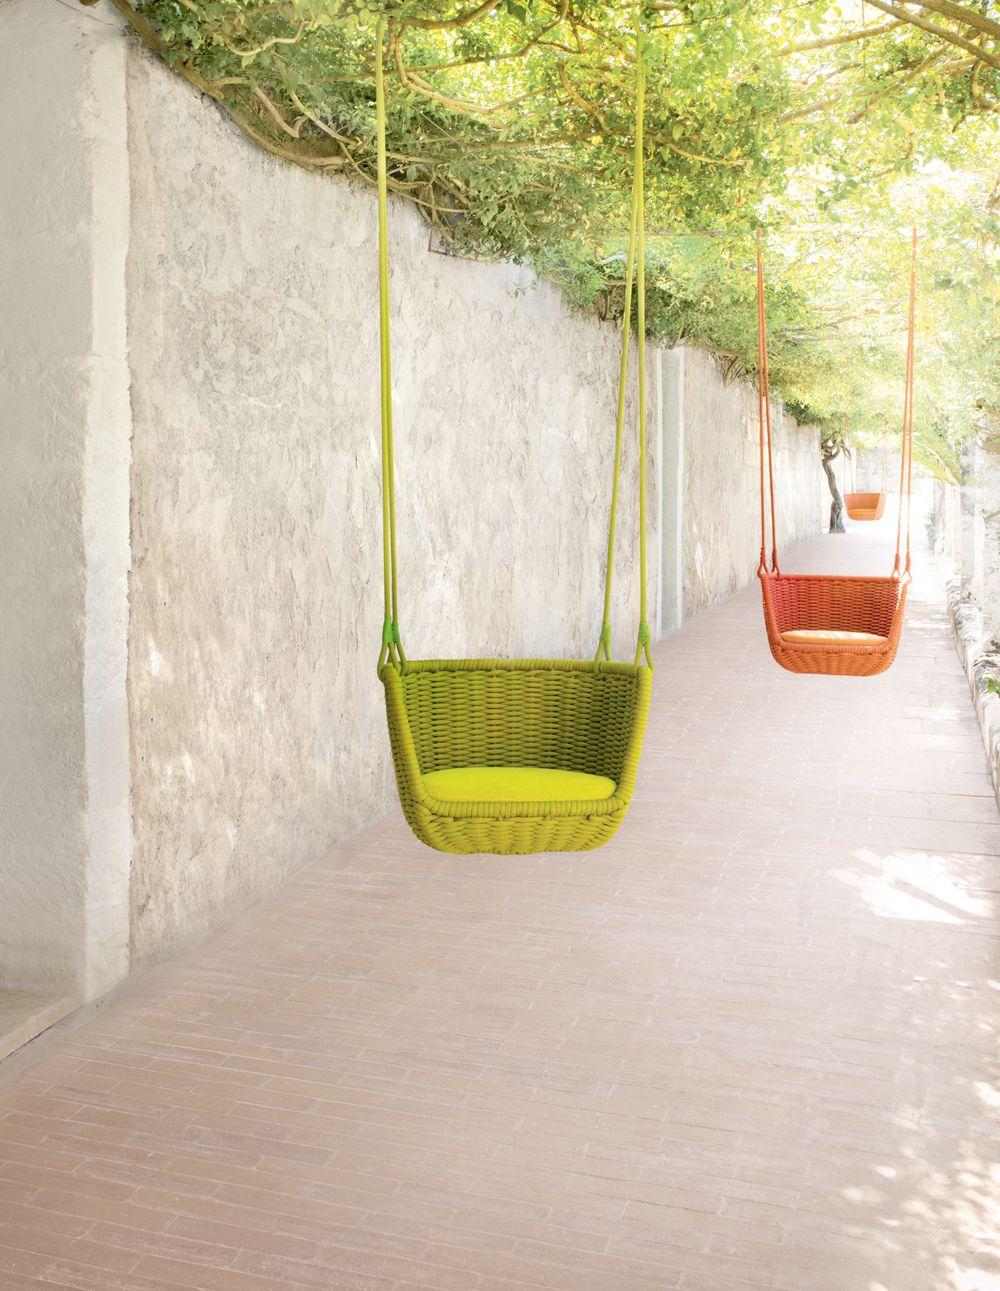 Adagio hanging chairs paola lenti swings pinterest hanging